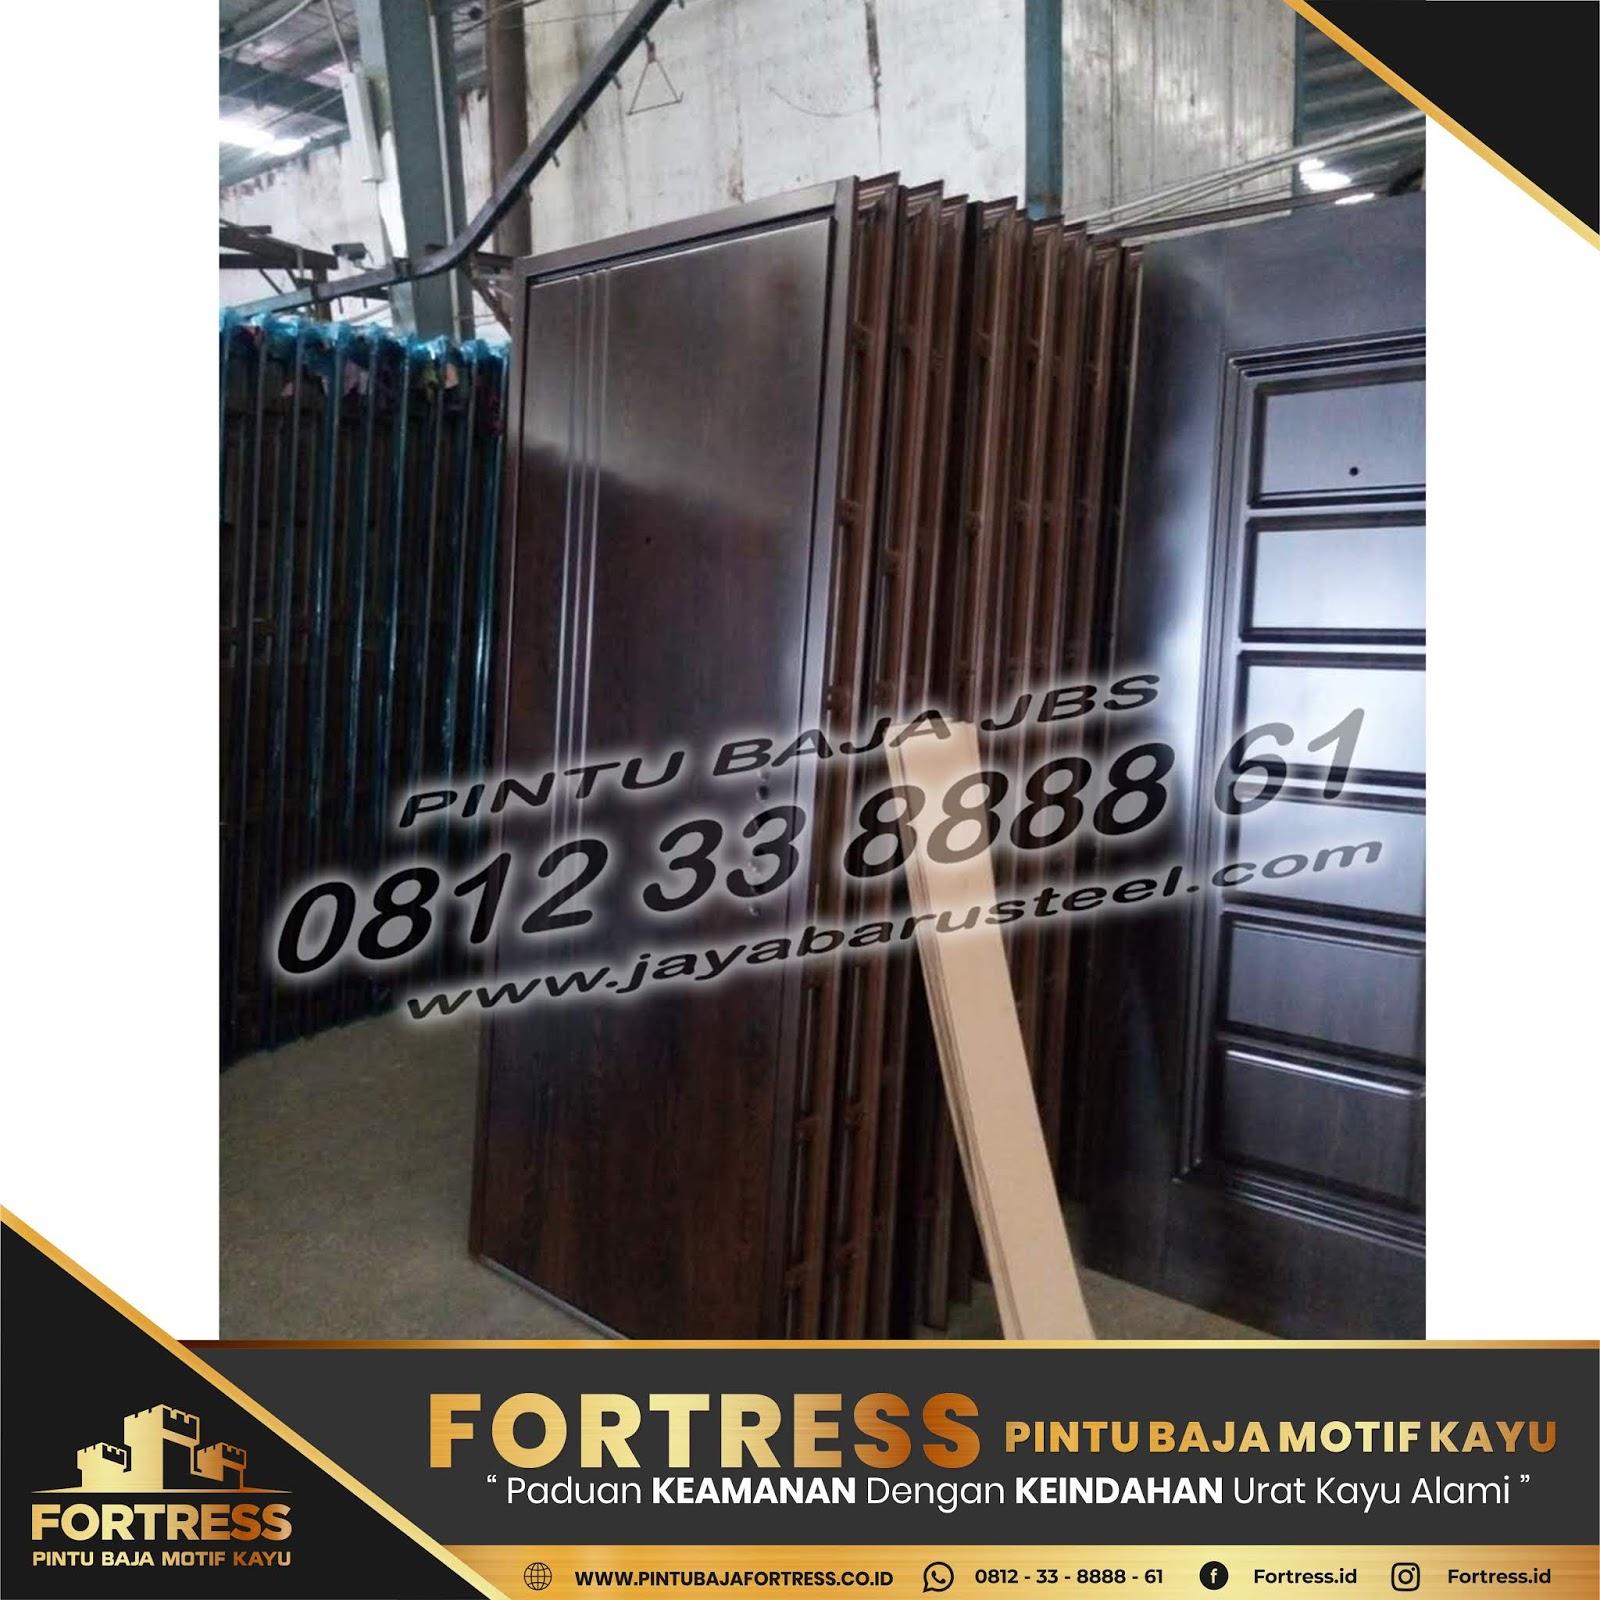 pabrik baja ringan terbesar di indonesia 0812 91 6261 07 jbs pintu klep pekan baru harga kasa